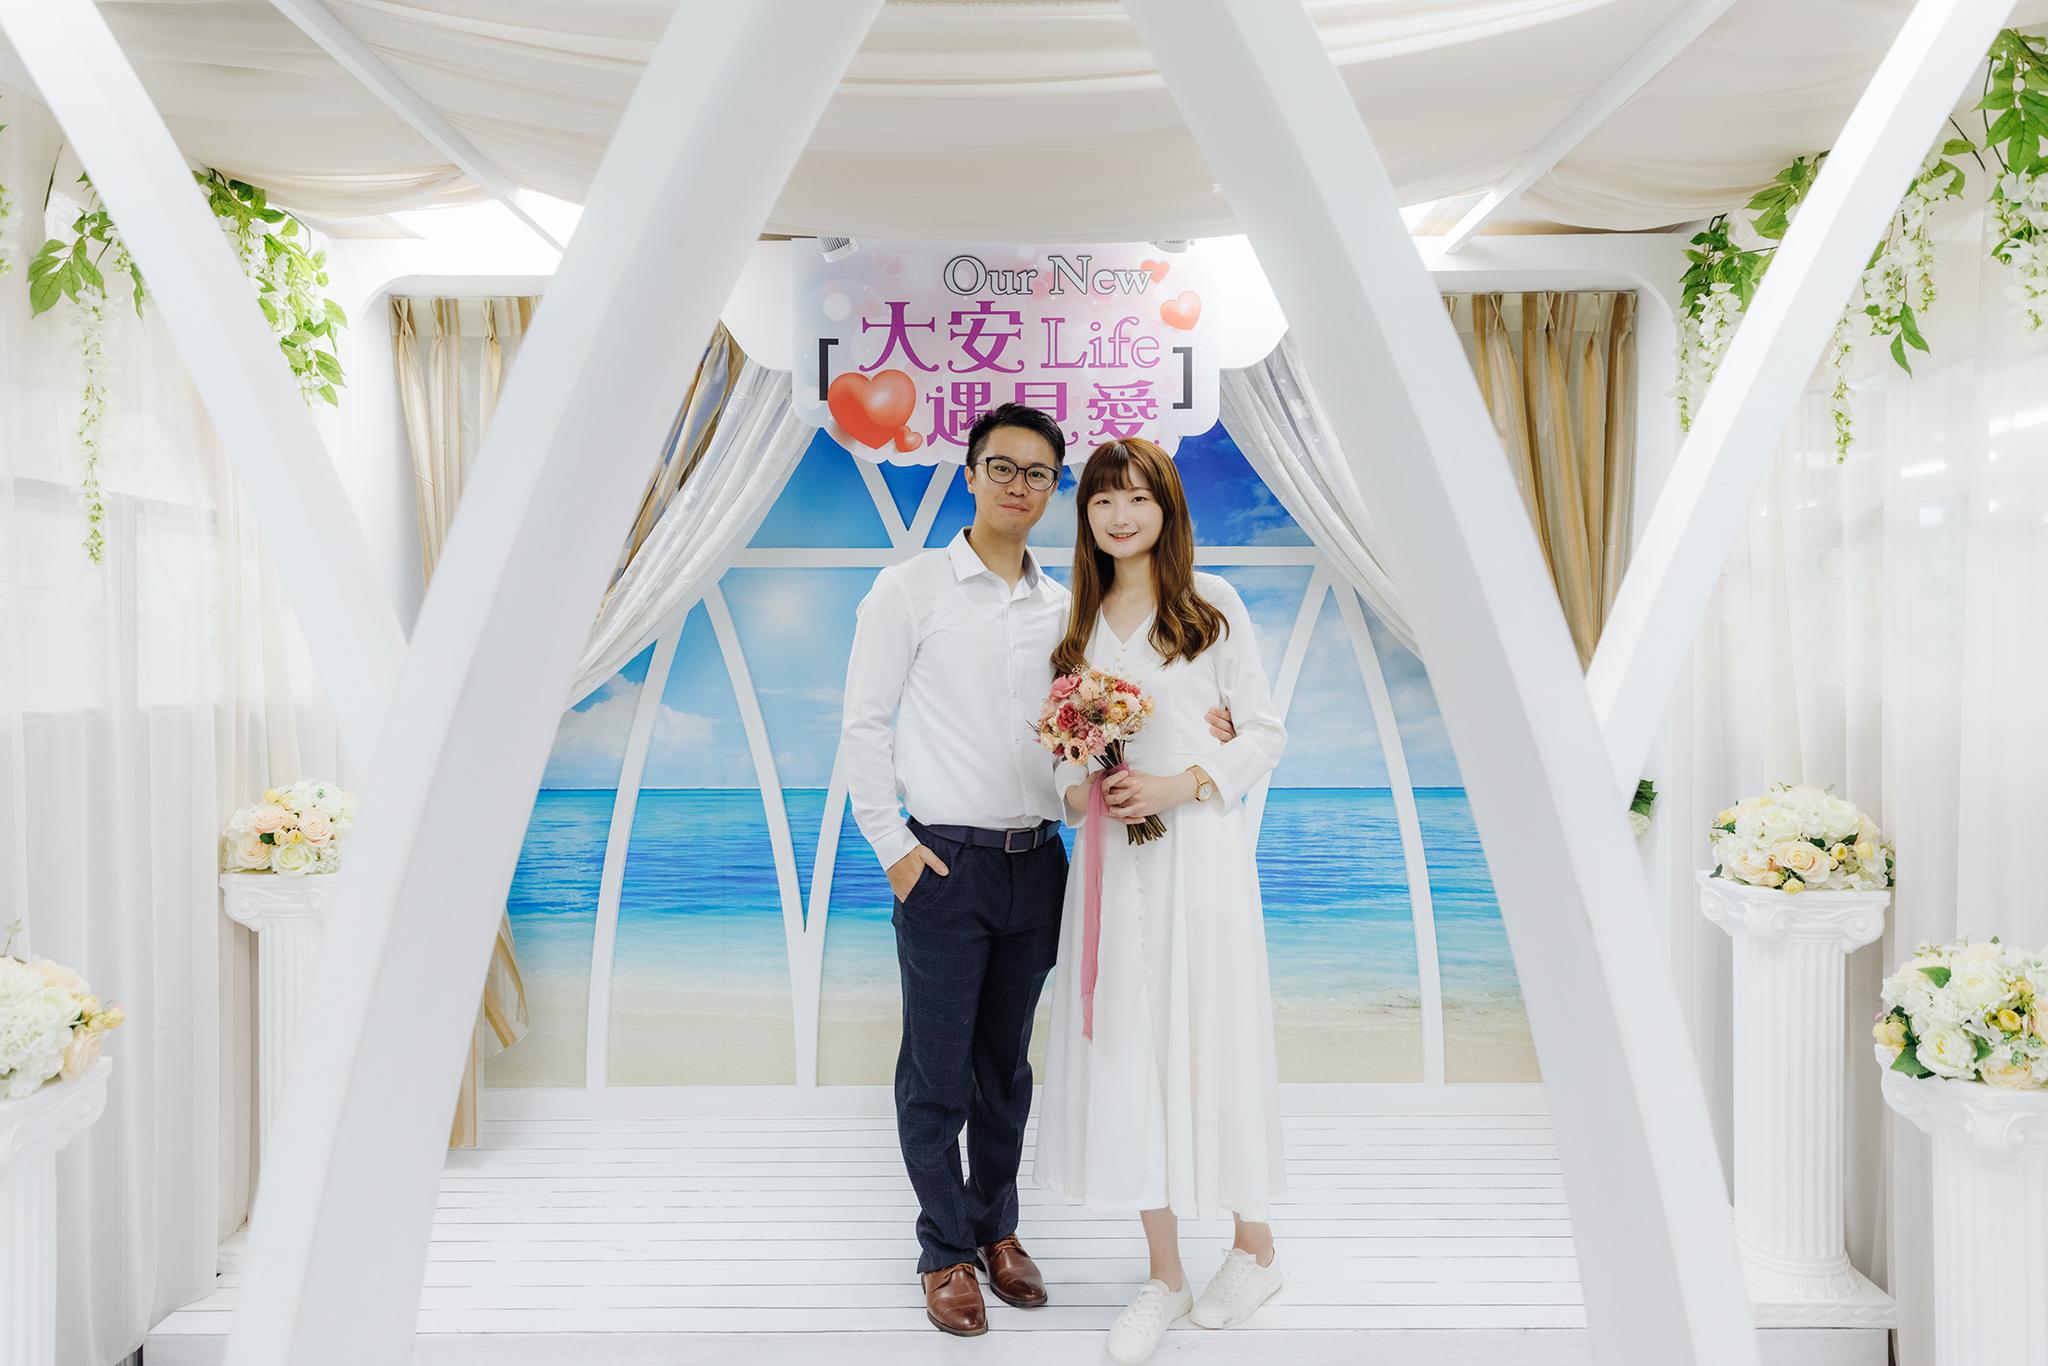 50667944651 7ae89eb839 o - 【證婚寫真】+宏哲&菀琳+